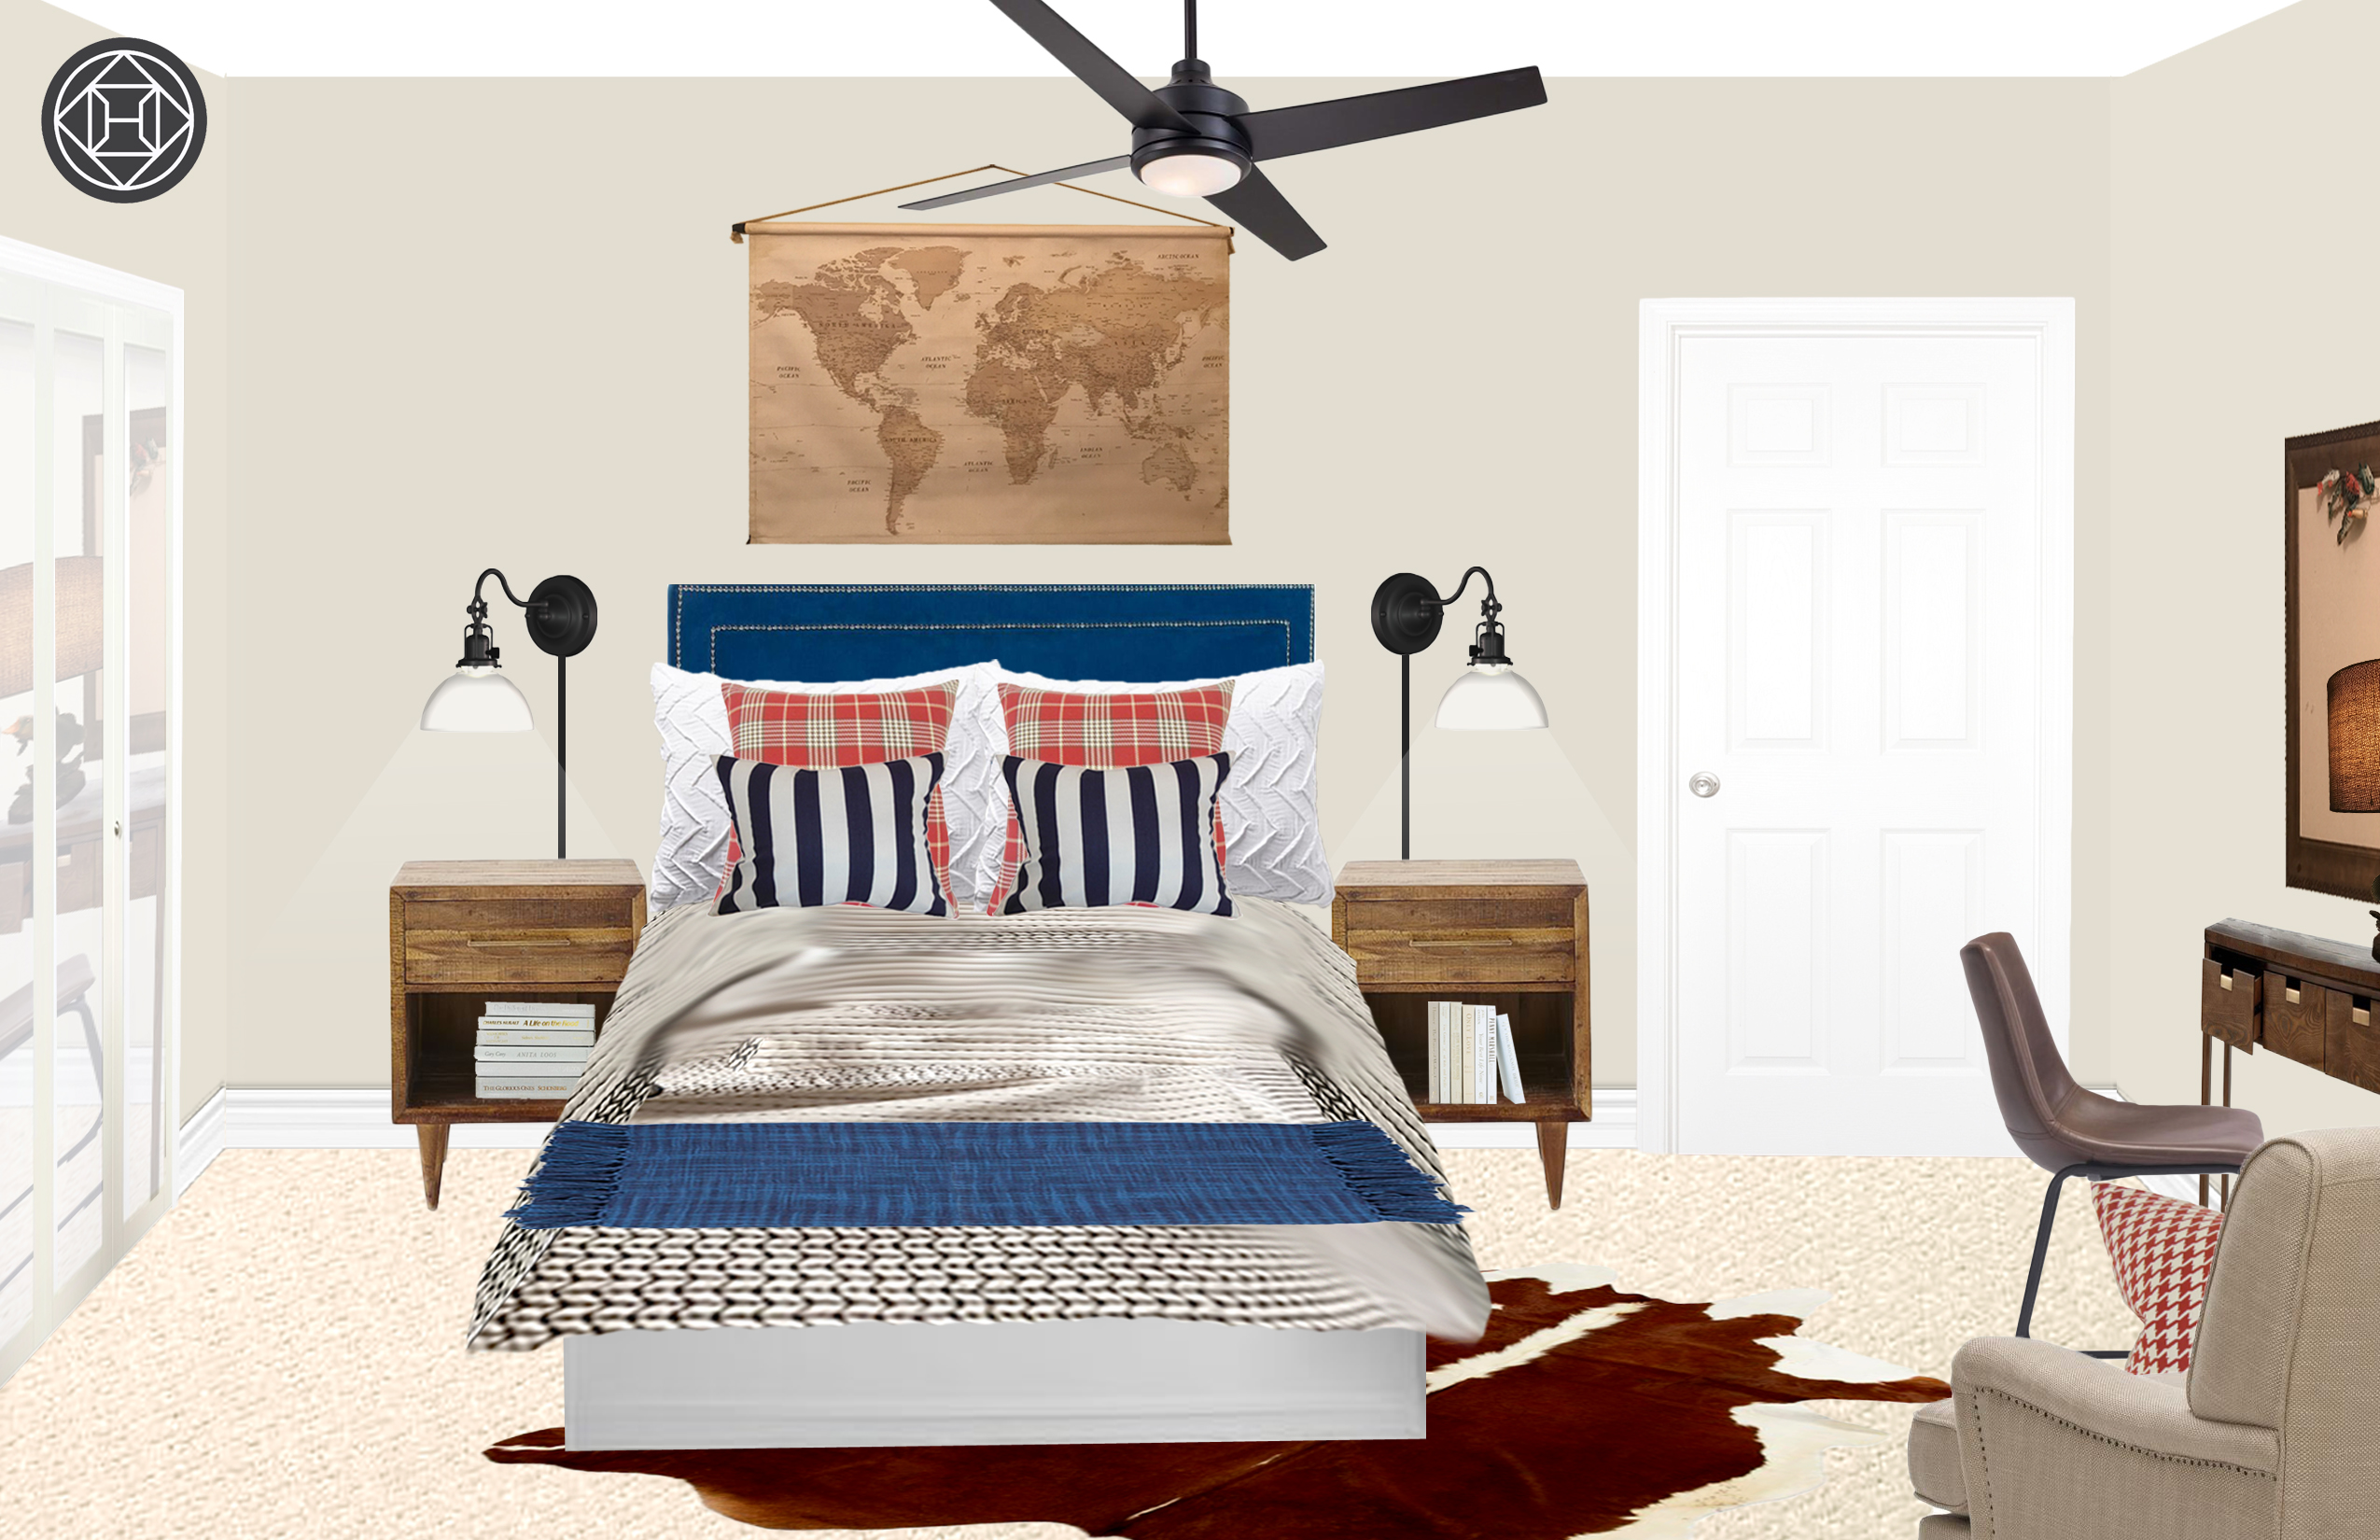 Beau Rustic Preppy Boy Bedroom With Navy Headboard